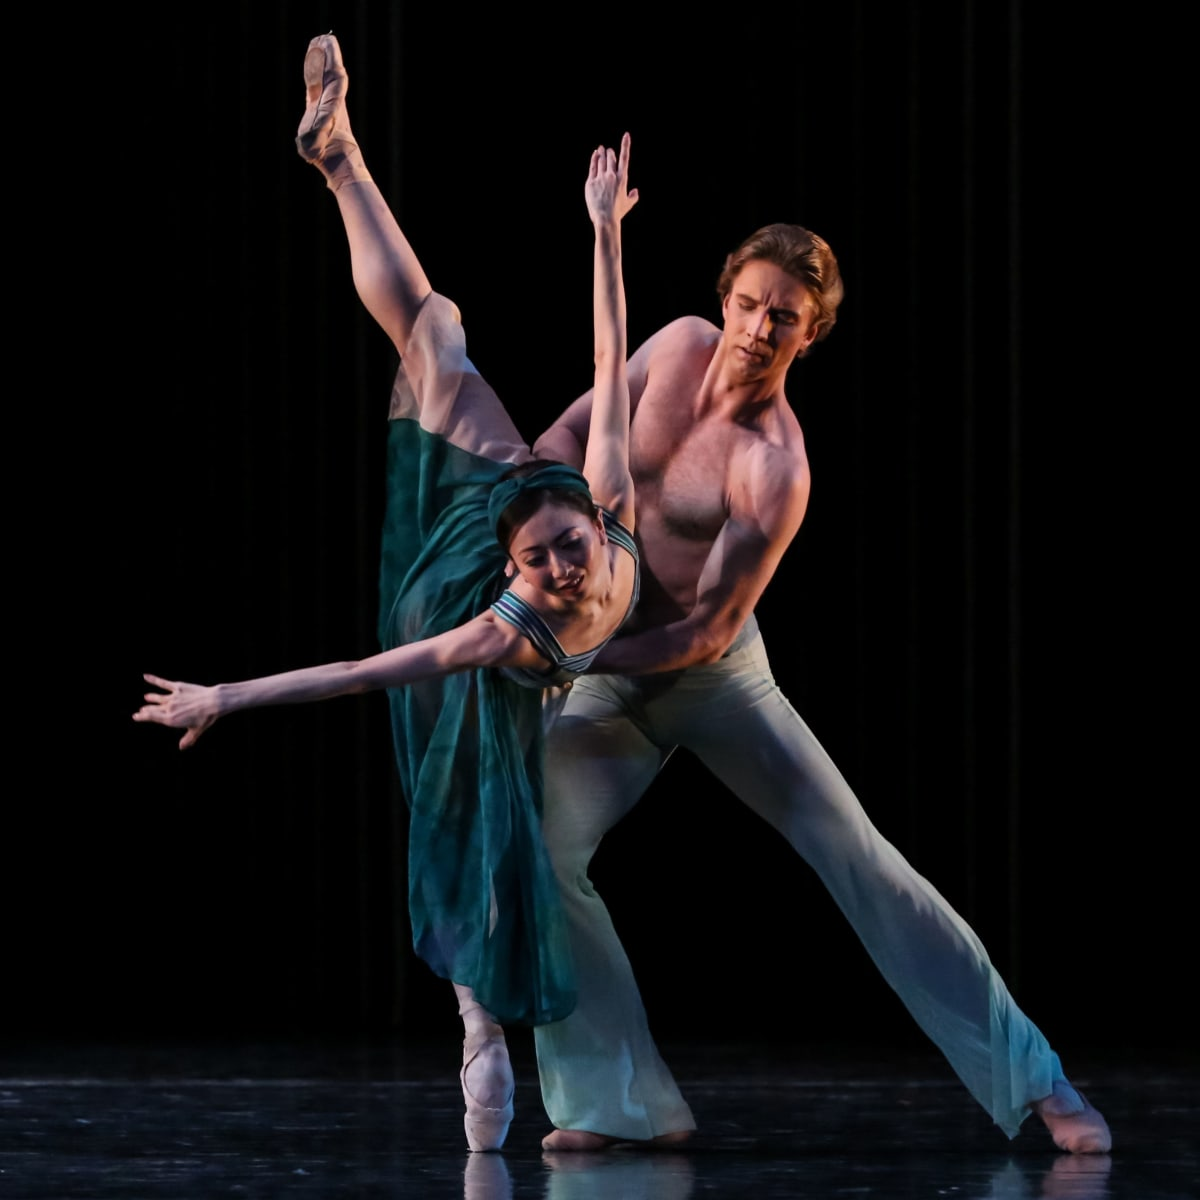 Yuriko Kajiya and Linnar Looris in Houston Ballet Tapestry